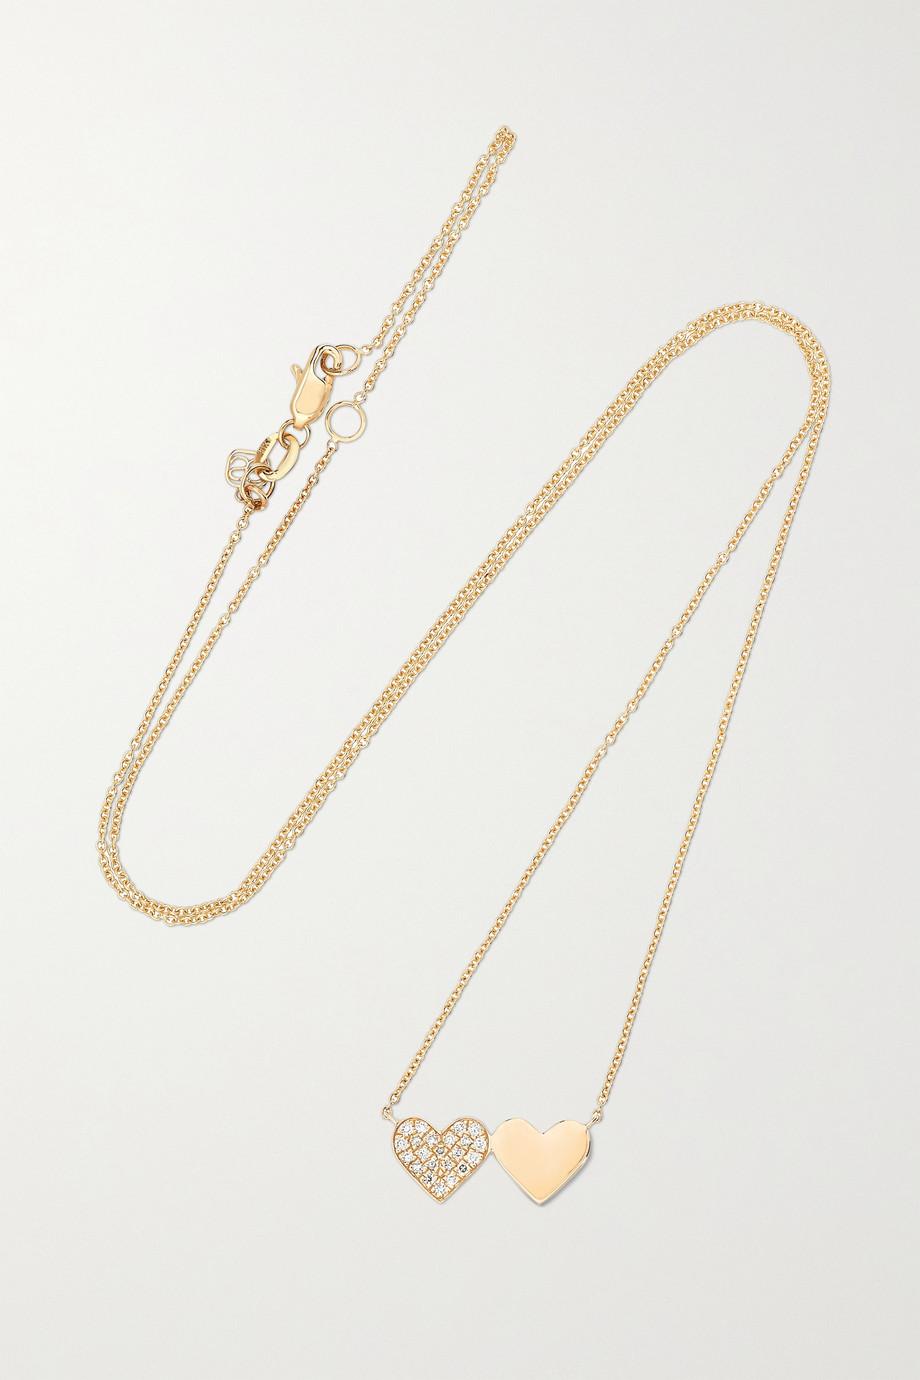 Sydney Evan Double Heart 14-karat gold diamond necklace